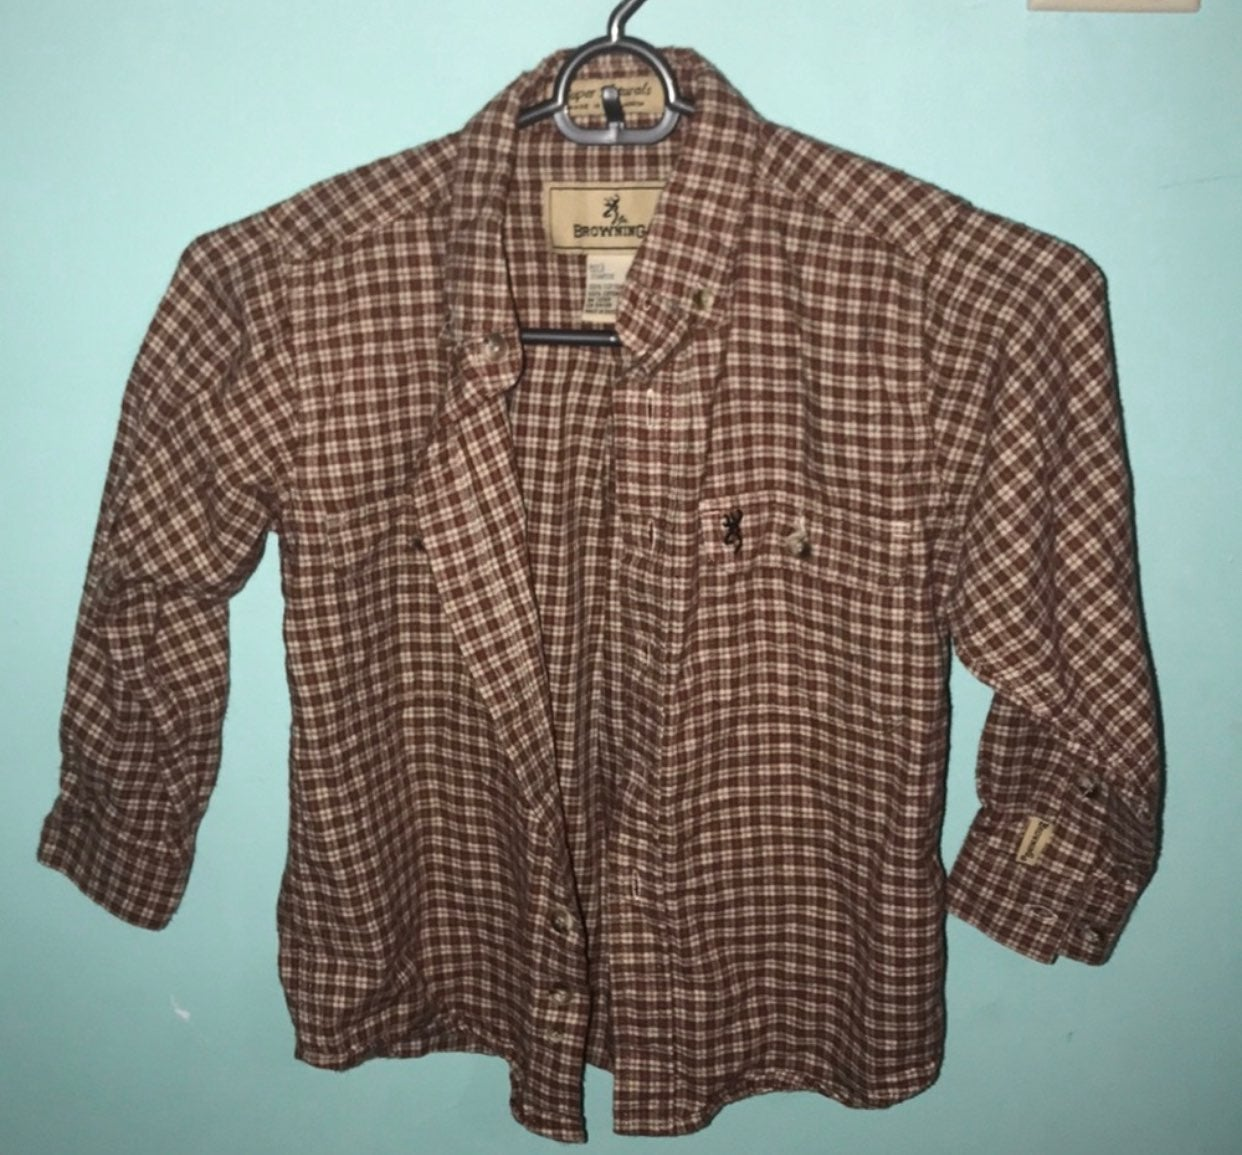 Browning plaid shirts